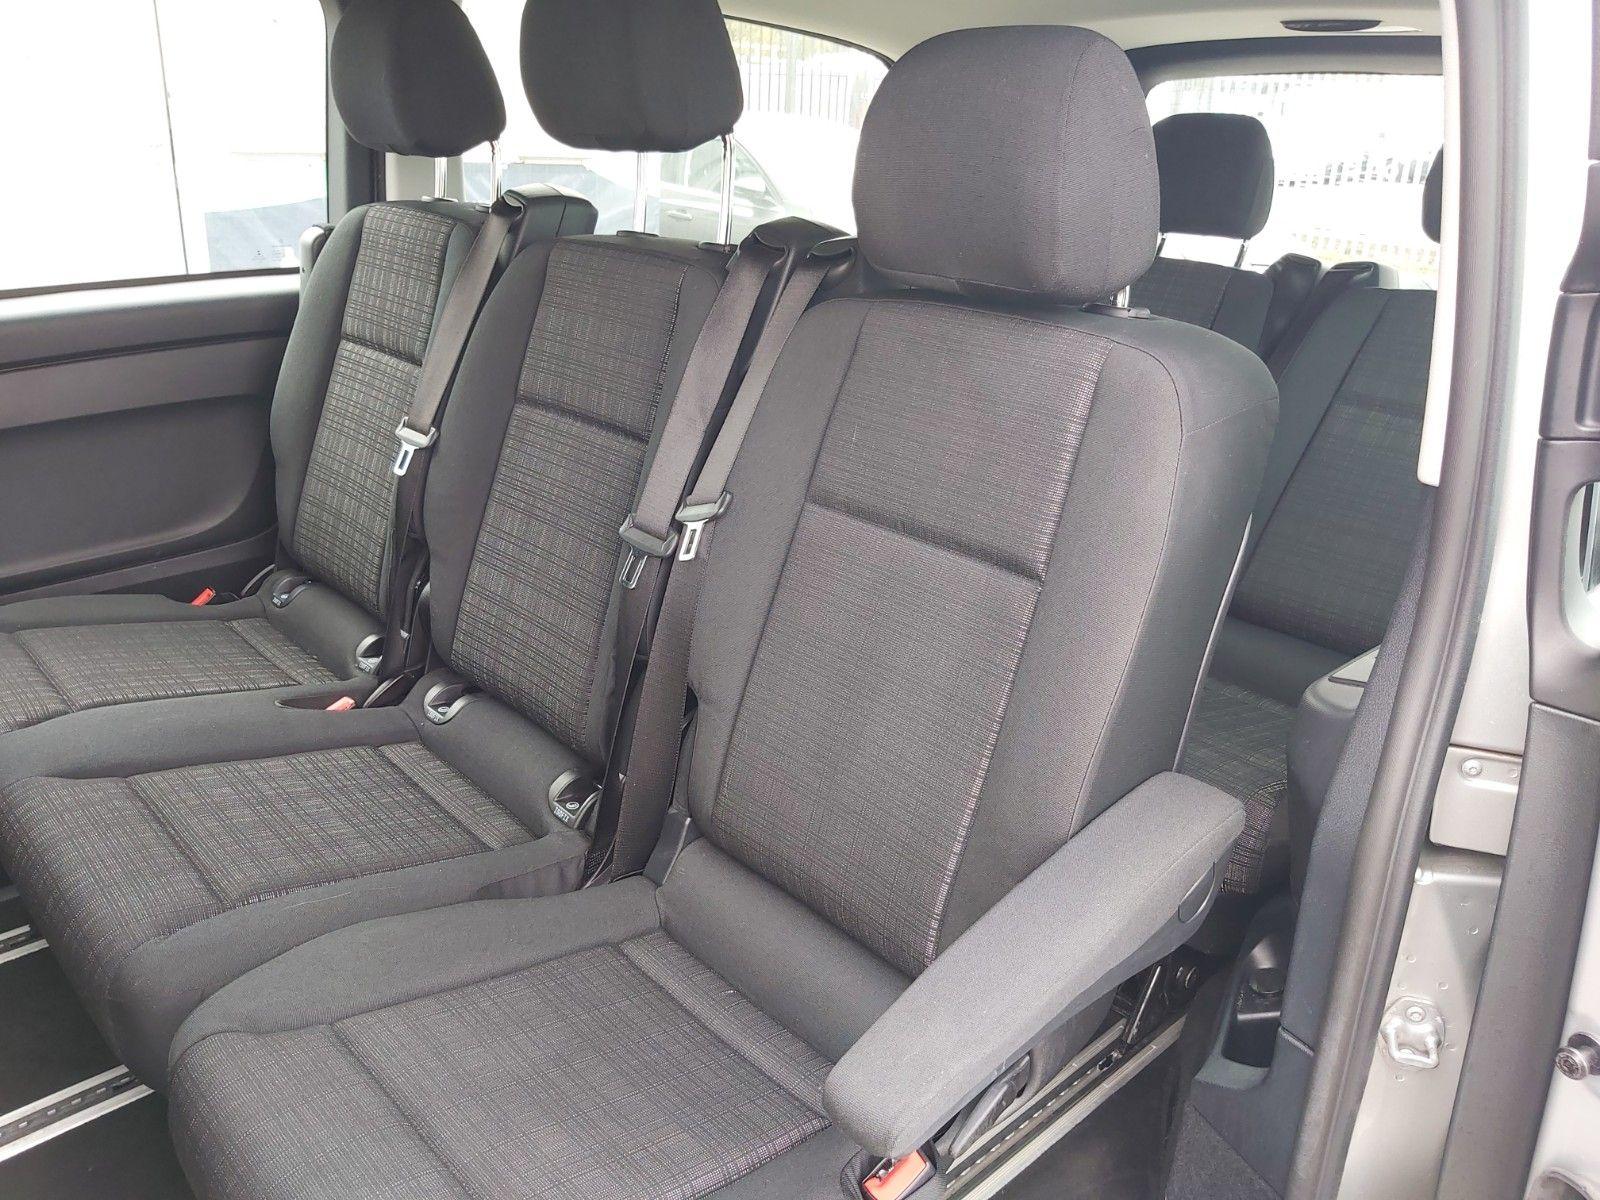 2019 Mercedes-Benz Vito 119 Cdi Select 8-Seater 7G-Tronic (KX19TVP) Image 11